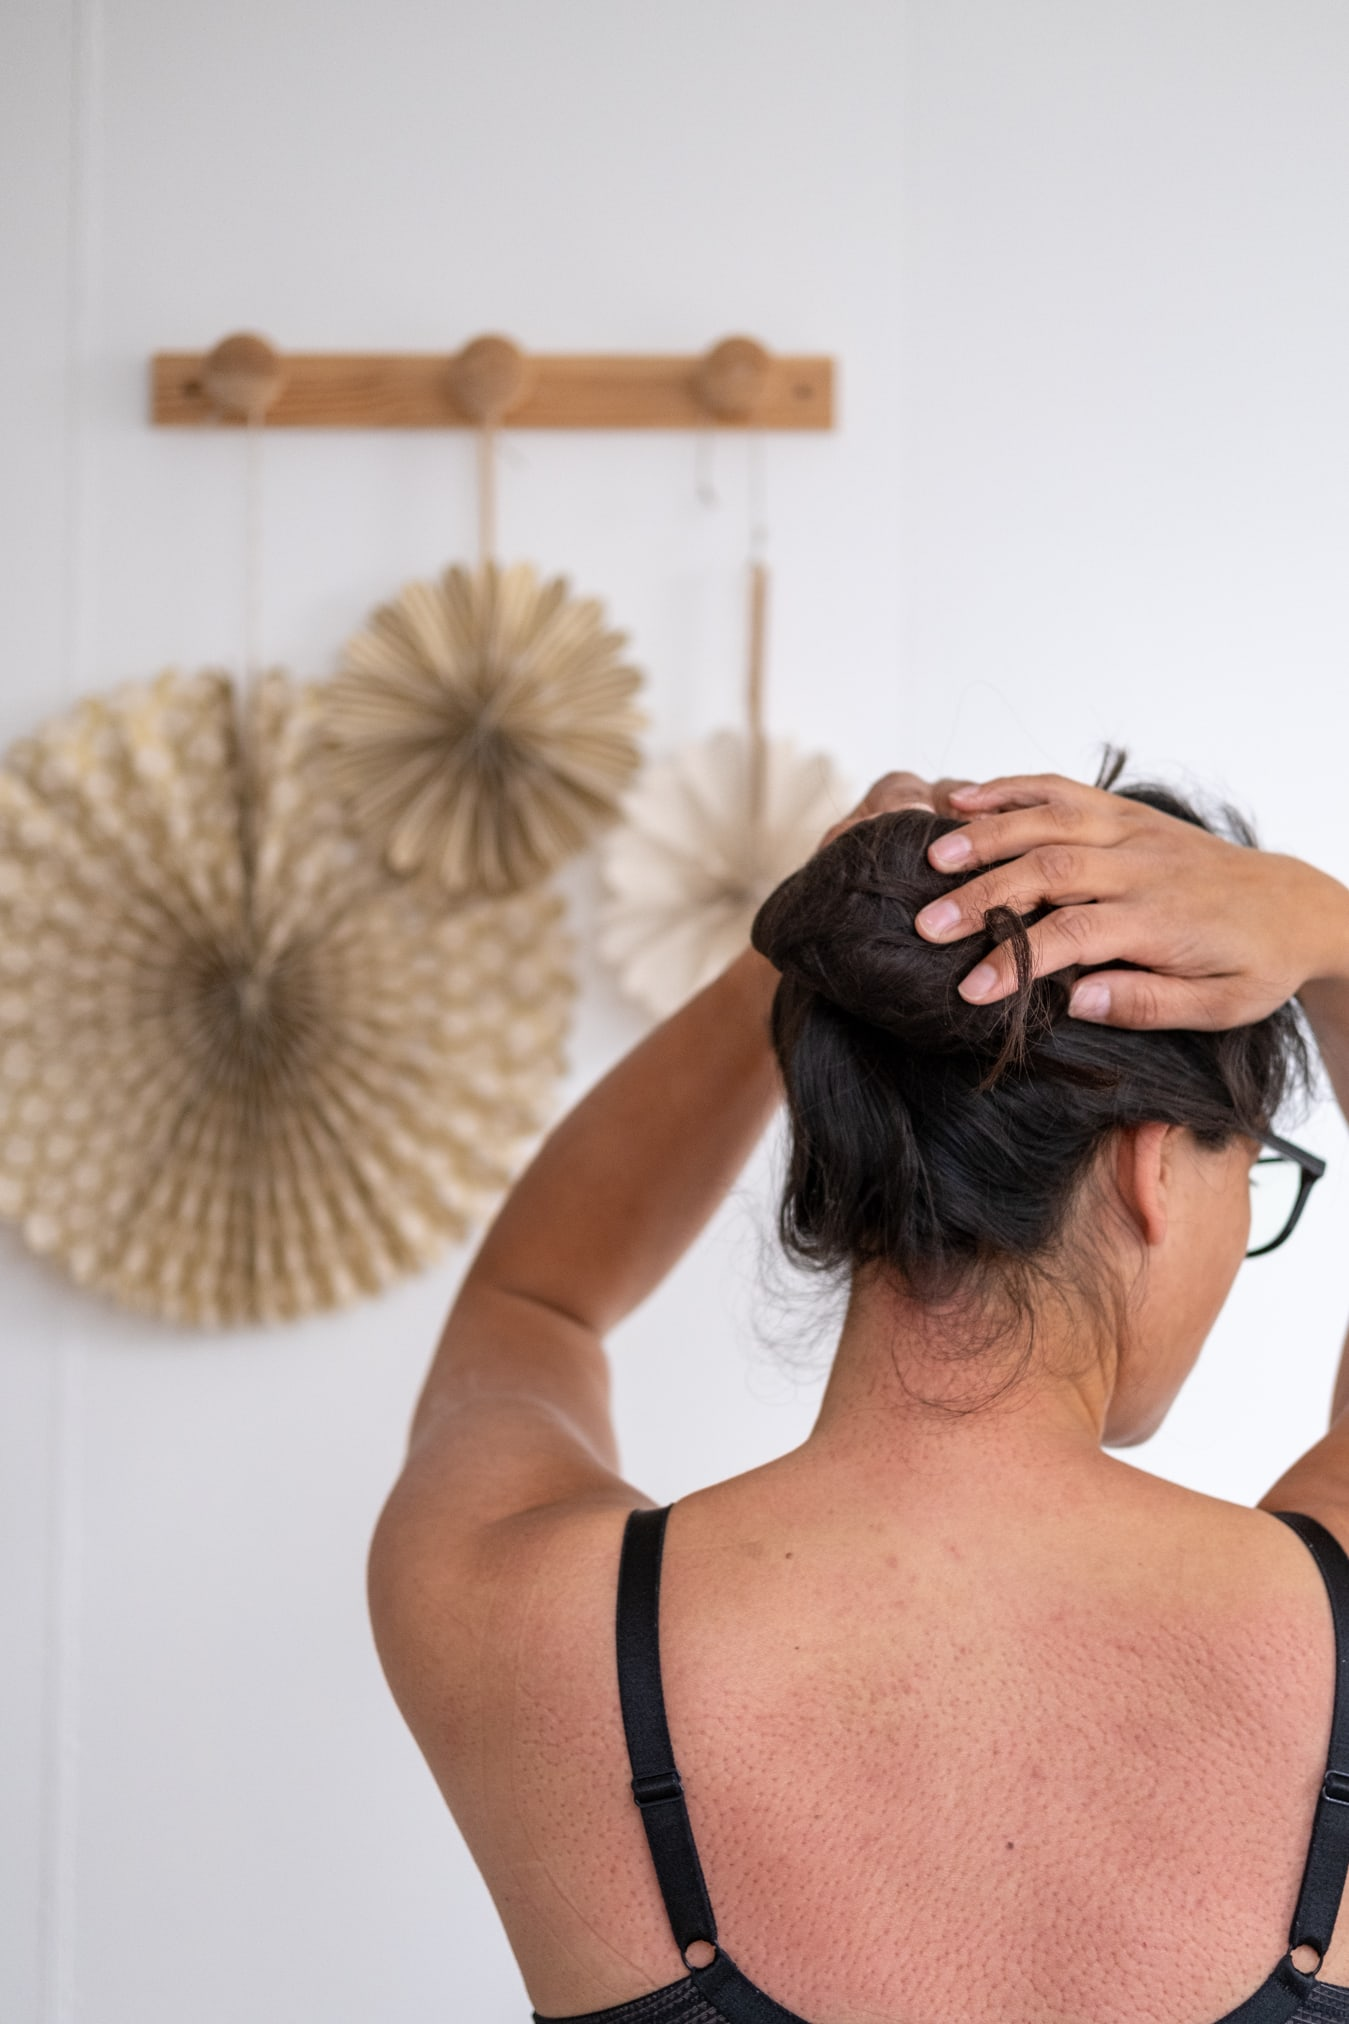 huid na acupressuurmat gebruik